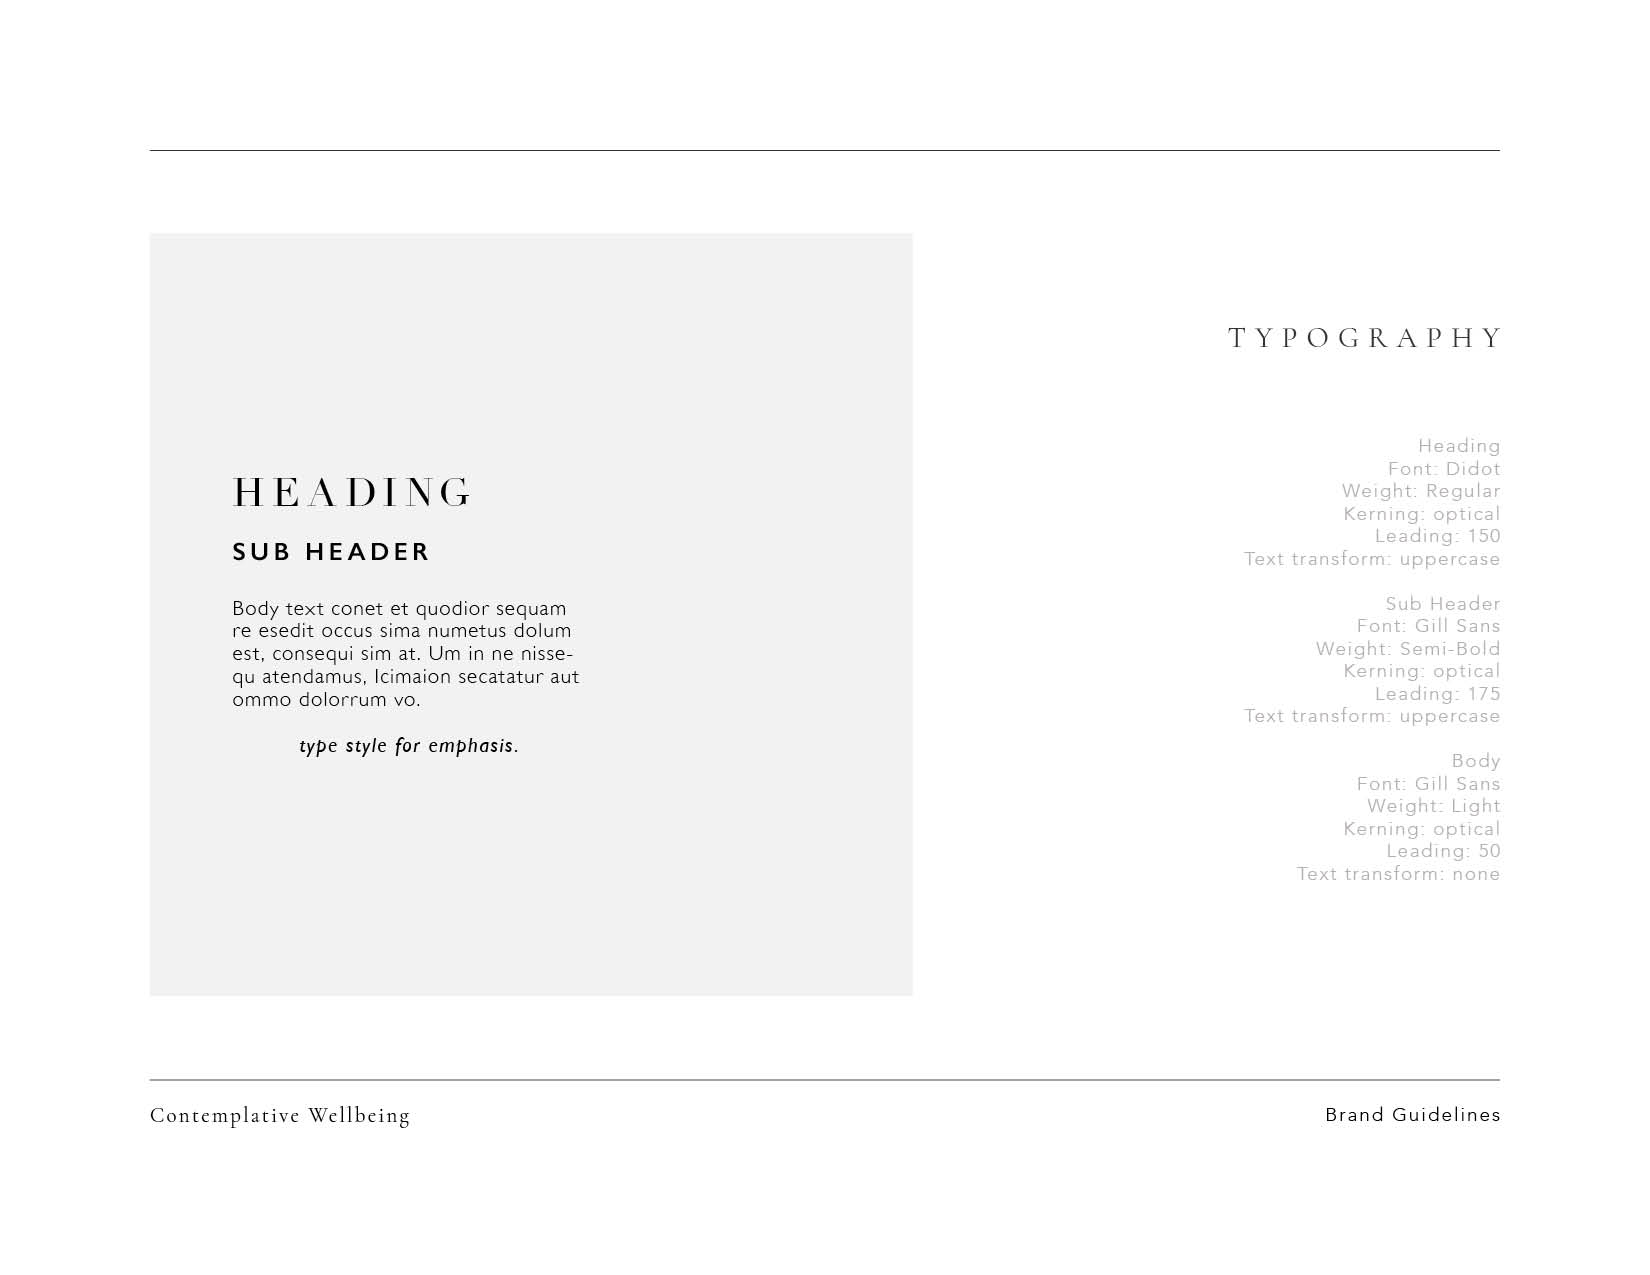 contemplative-wellbeing_brand-guidelines4.jpg